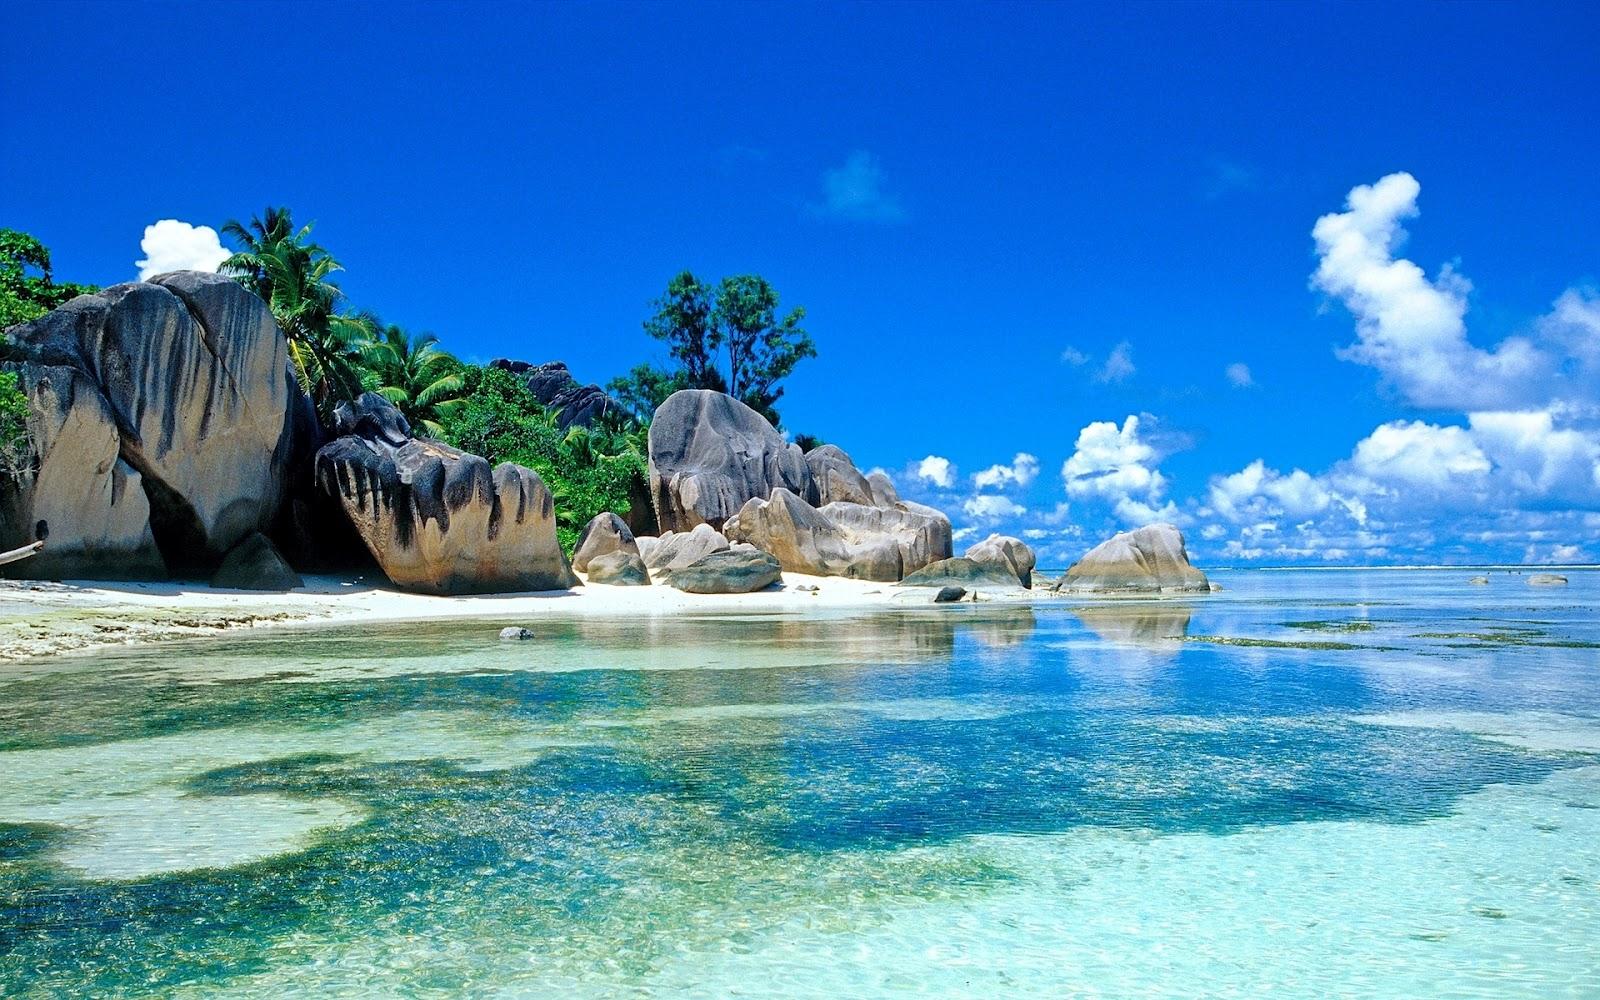 Fotos de paisajes mar